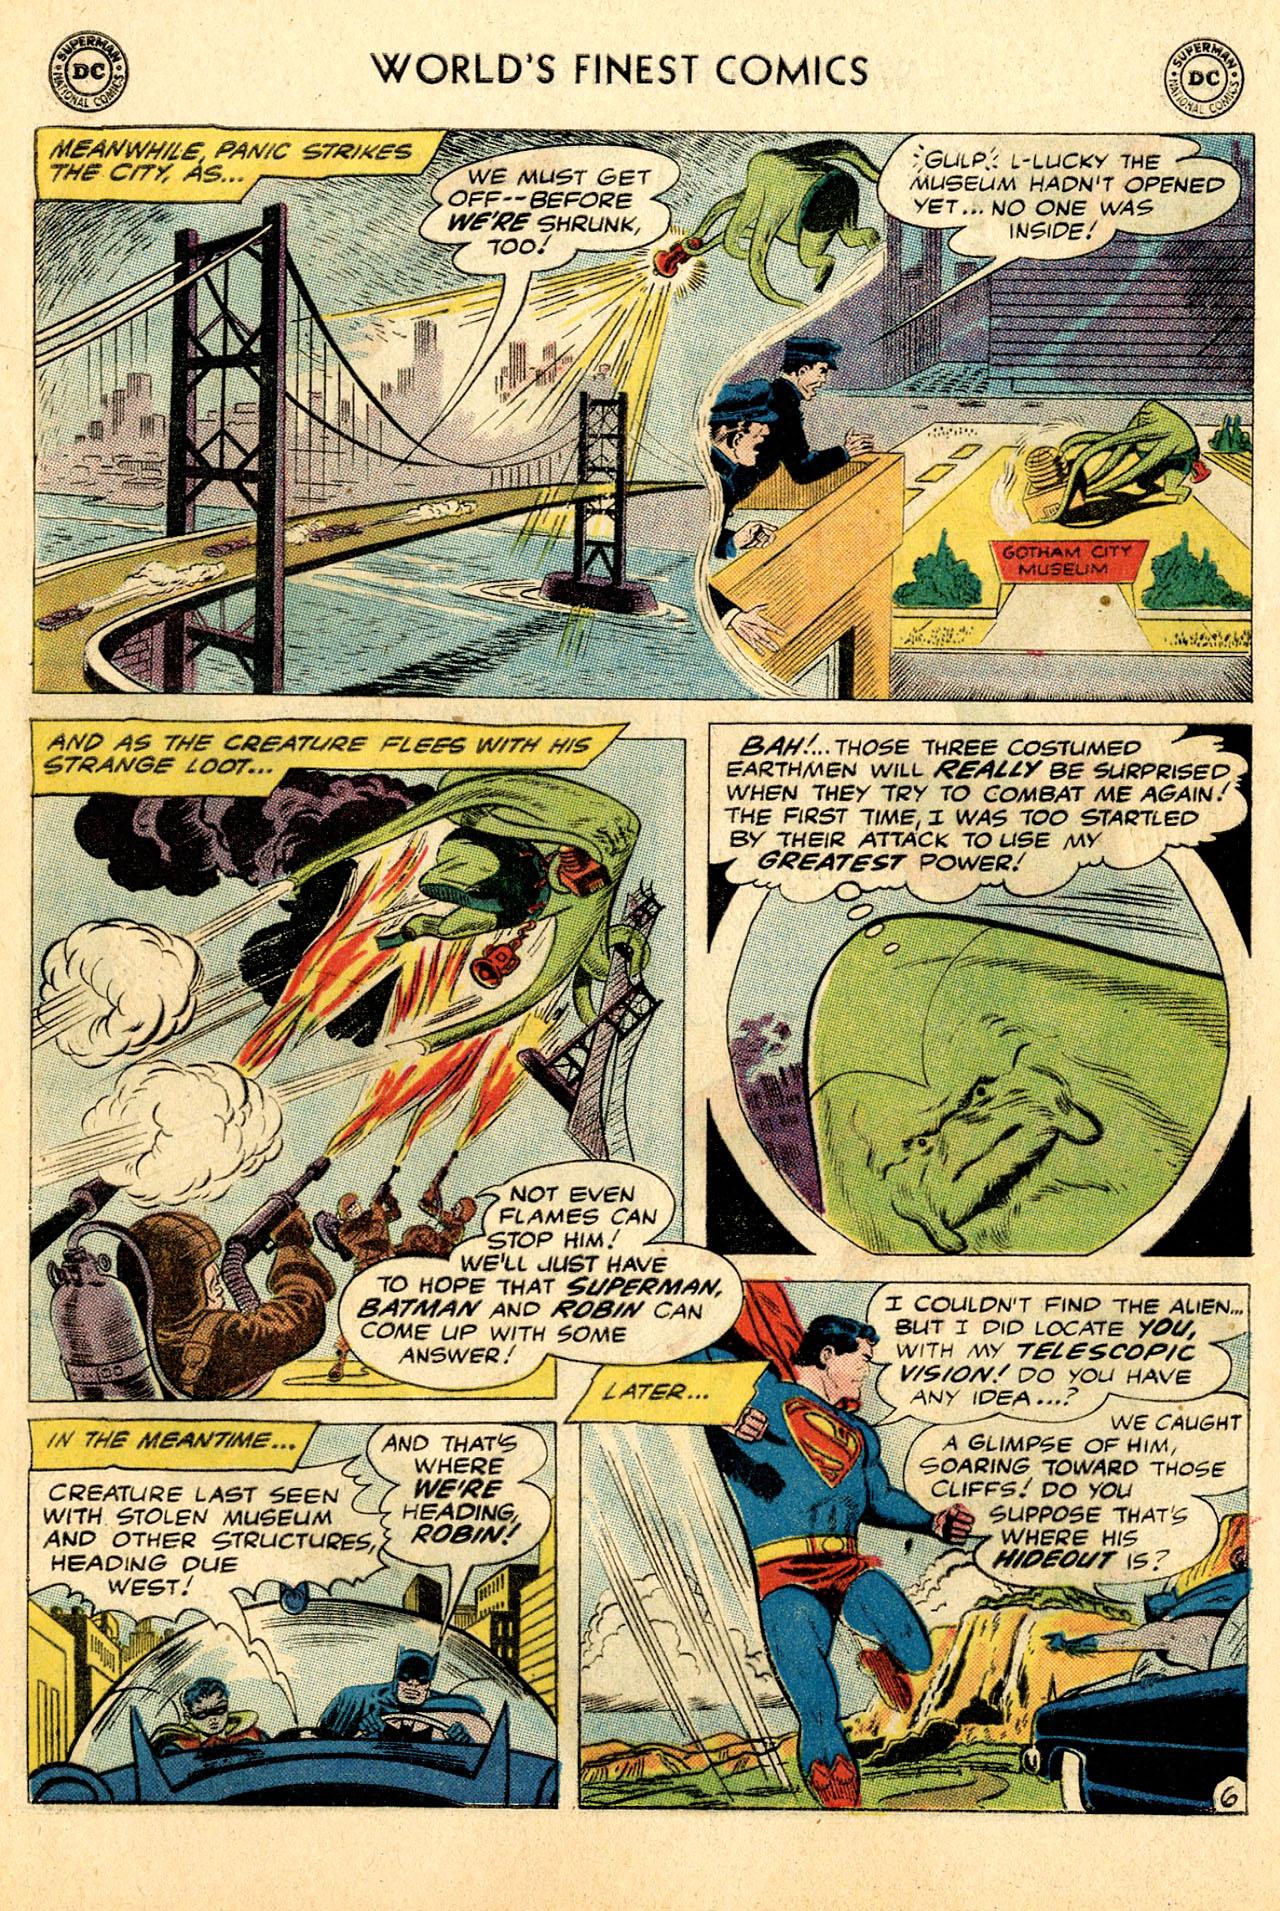 Read online World's Finest Comics comic -  Issue #110 - 8